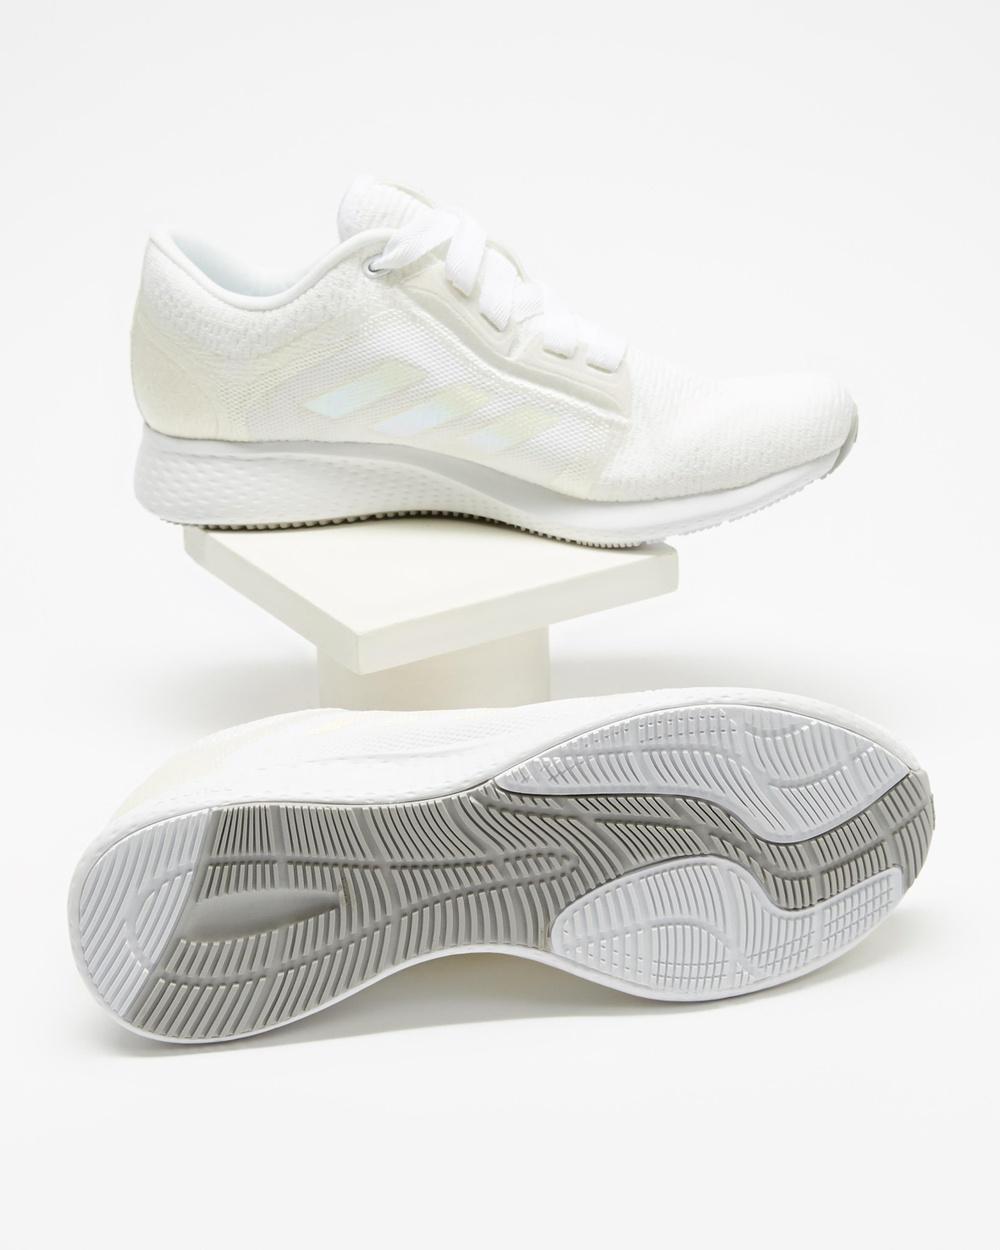 adidas Performance Edge Lux 4 Women's Running Shoes Cloud White, Cloud White & Grey Two Australia